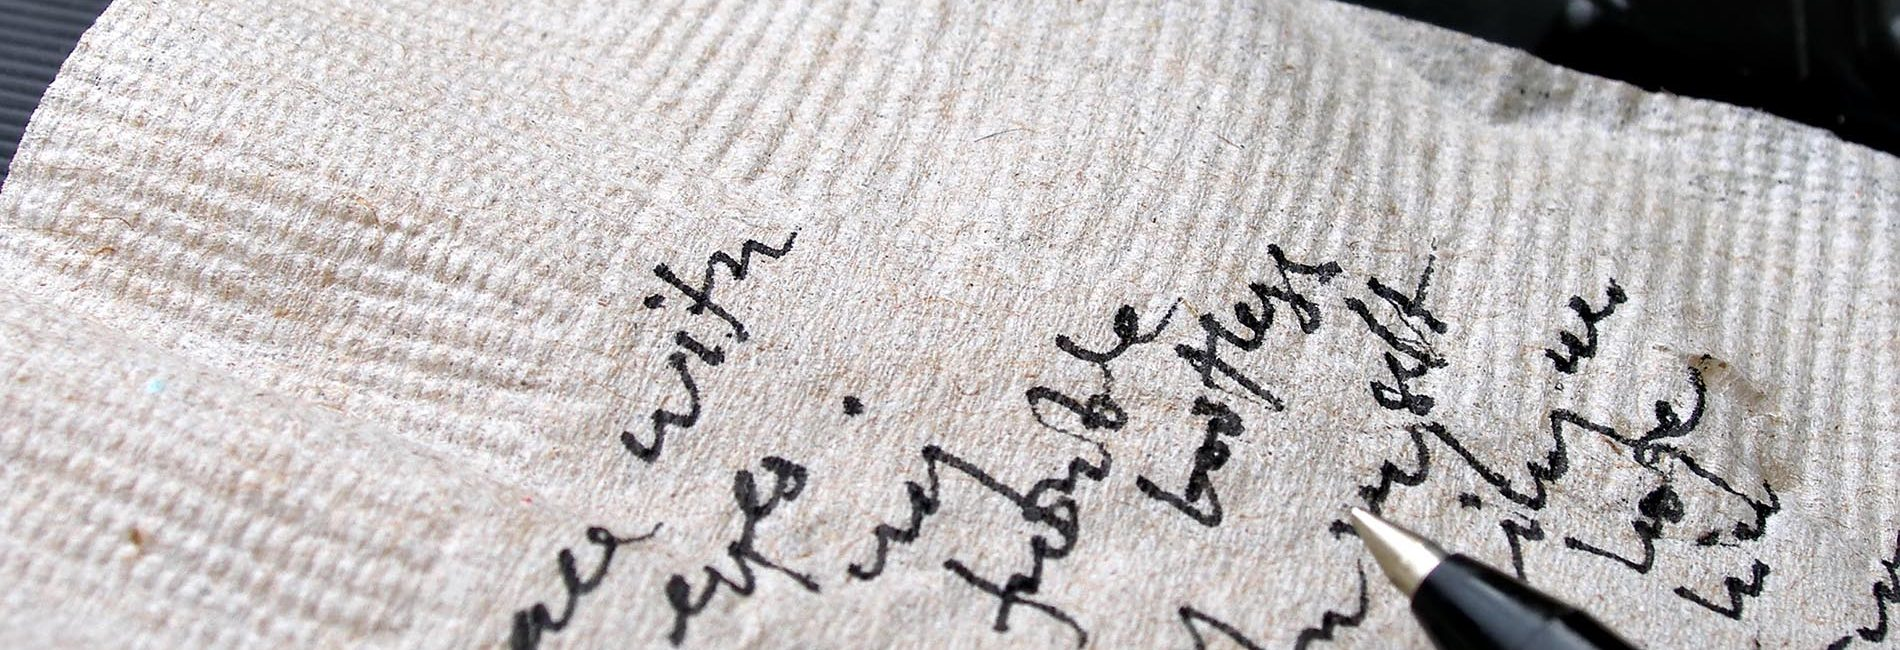 napkin writing